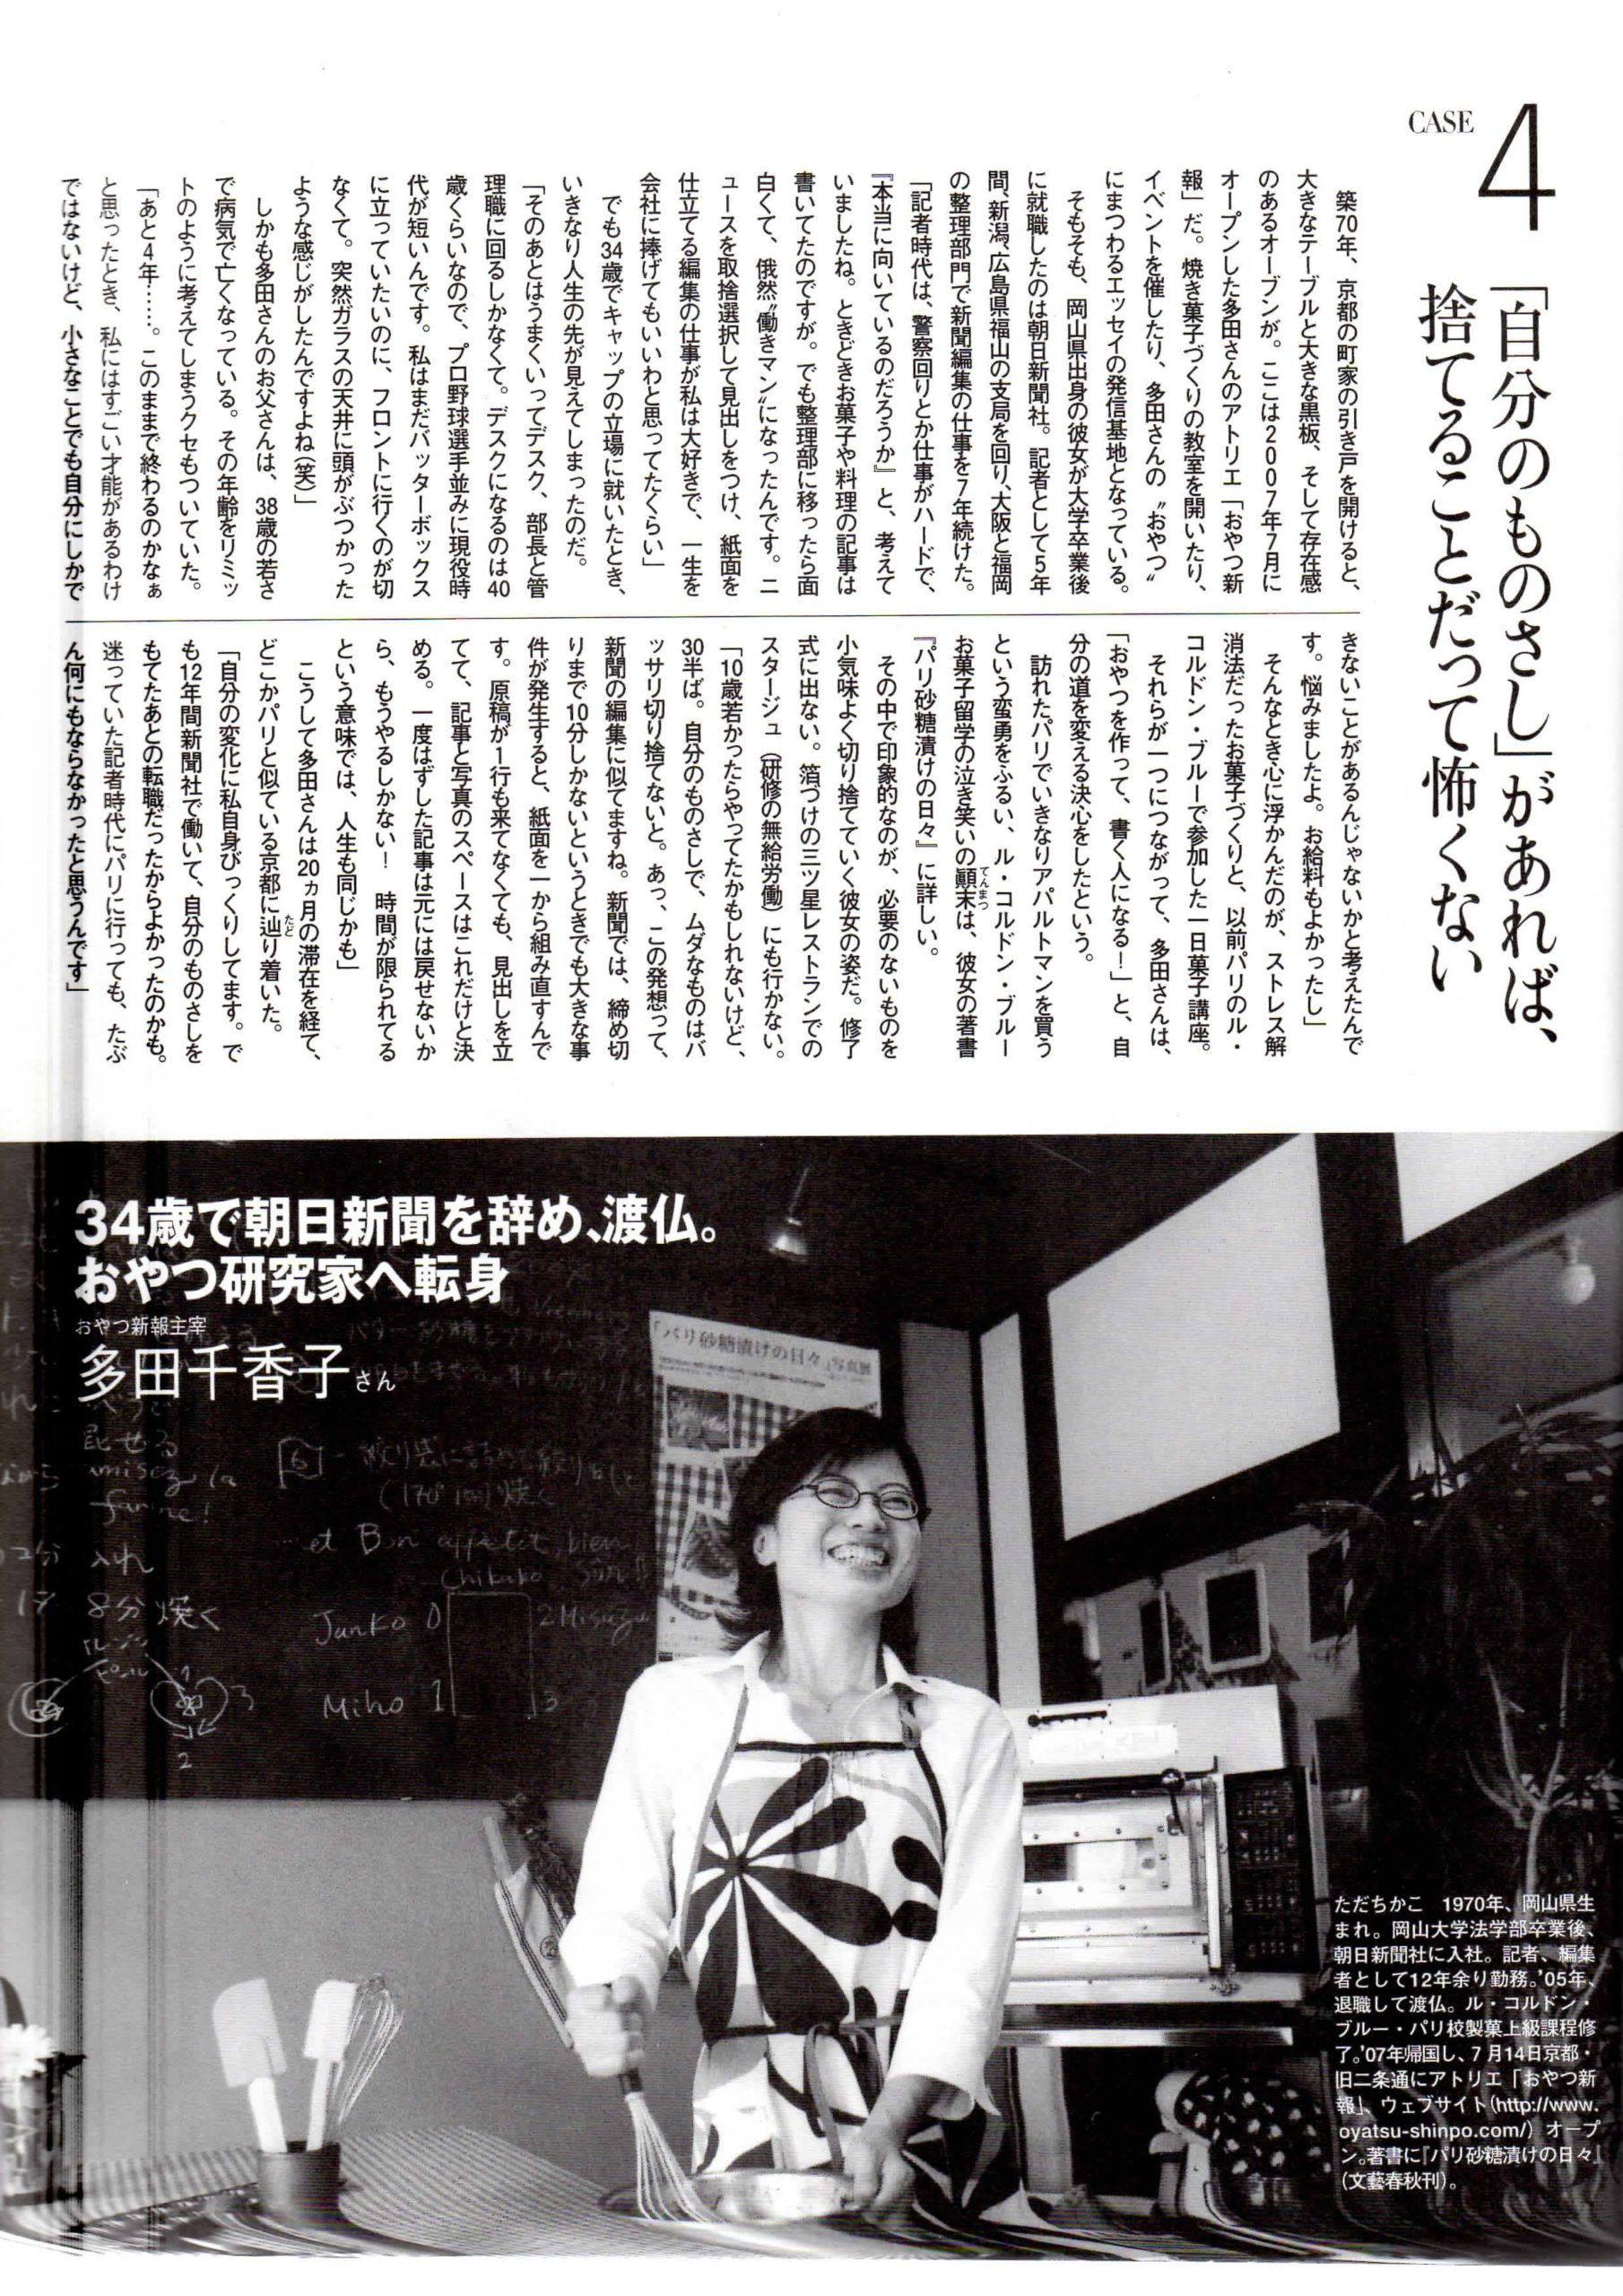 Grazia2007年12月号(おそらく)の特集ページ